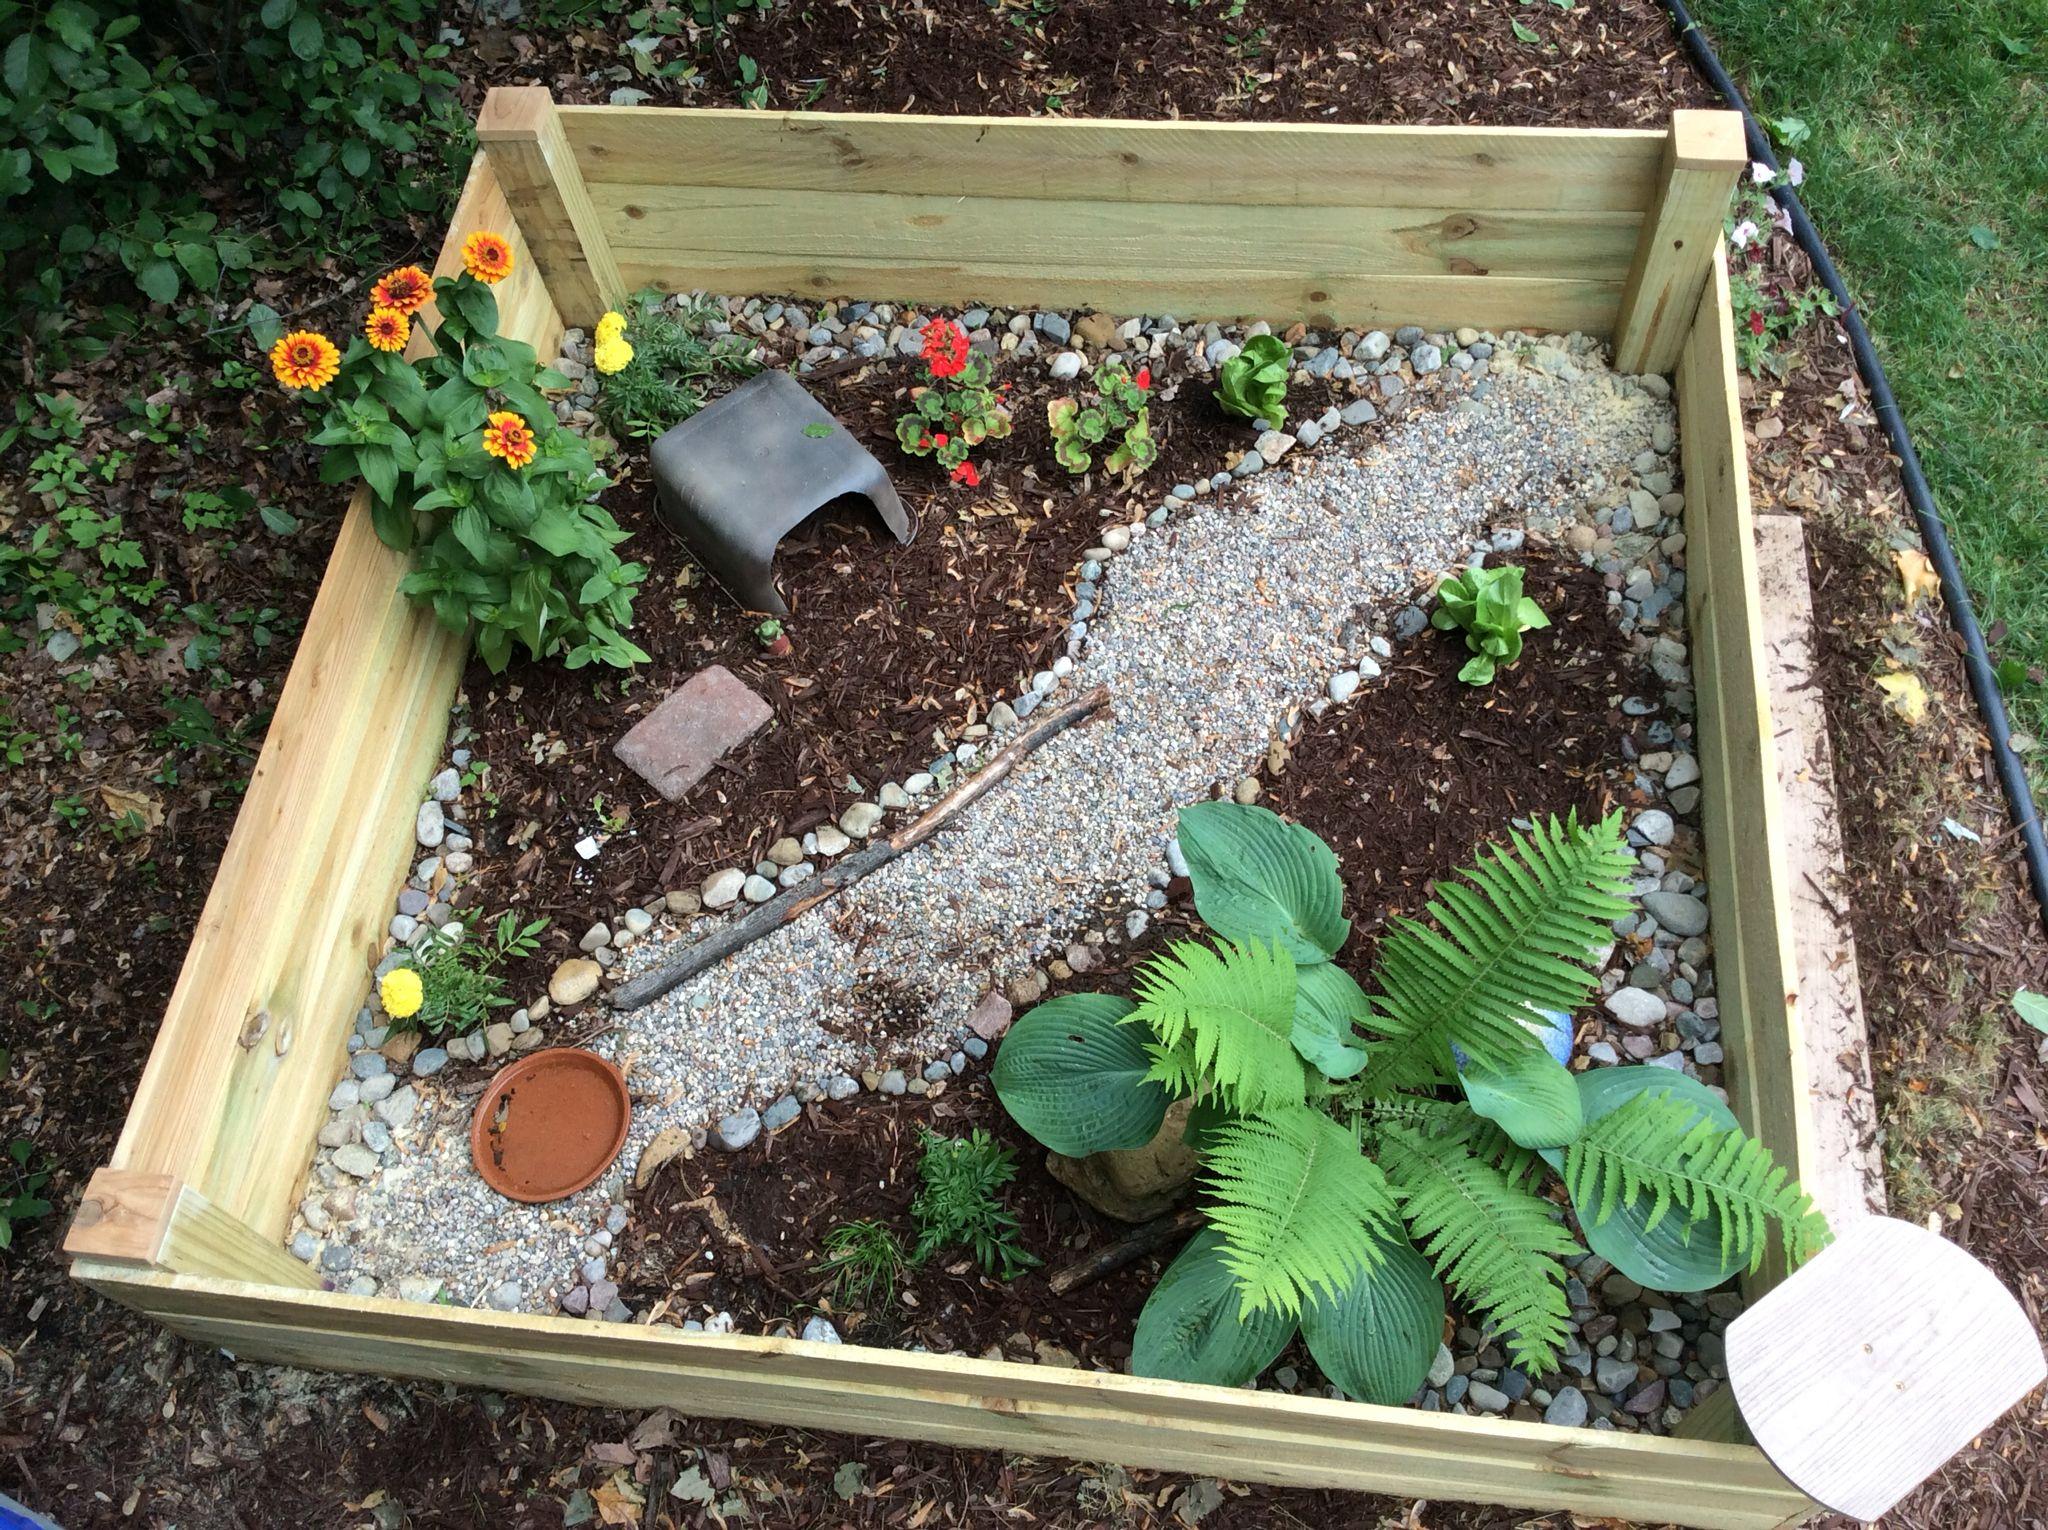 Outdoor Tortoise Enclosure Made Using Cedar Fence Boards